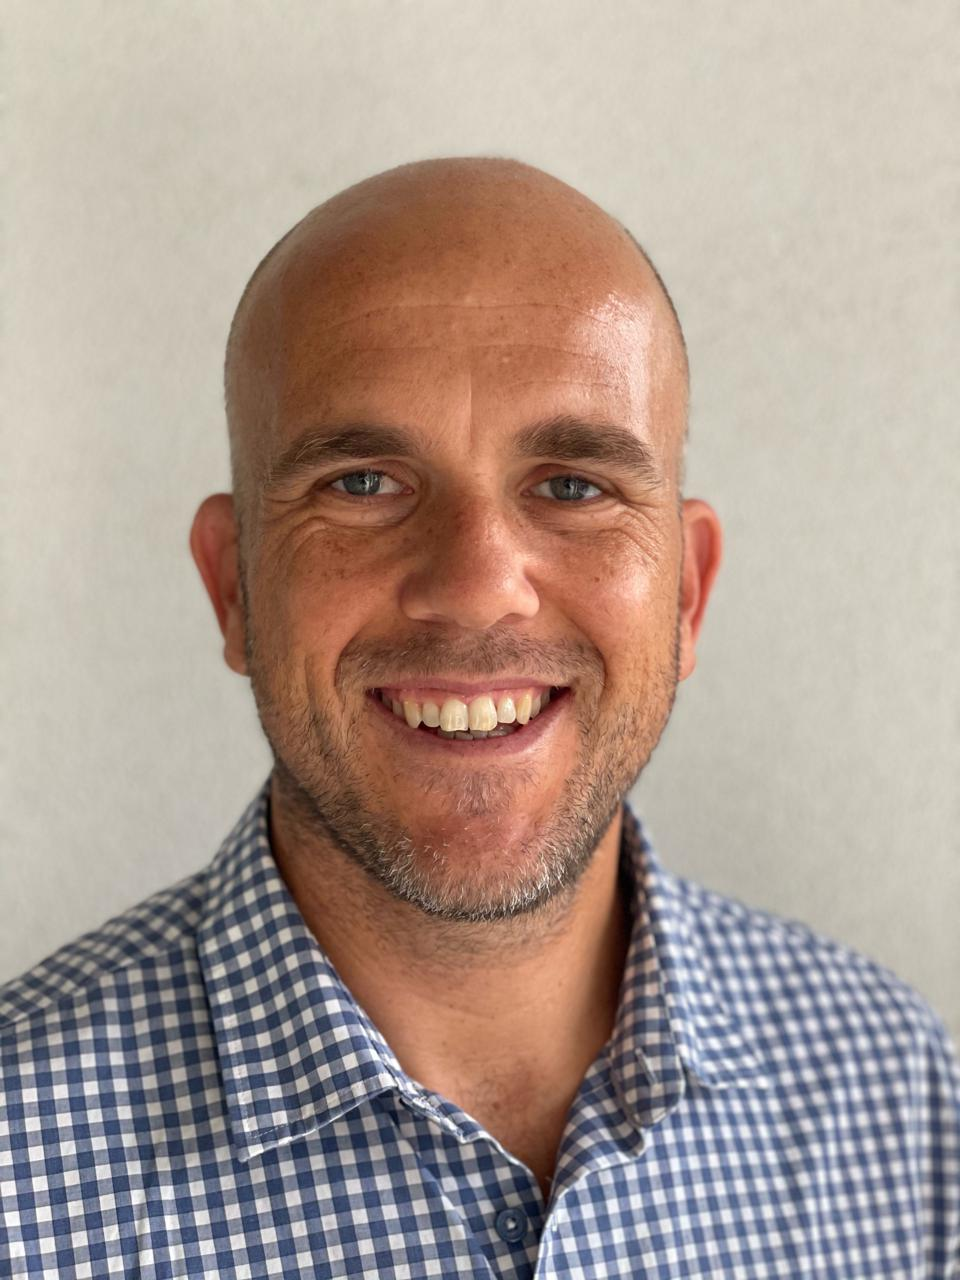 Headshot of Emile Cloete, Digital Lead - Construction at Woollam Constructions